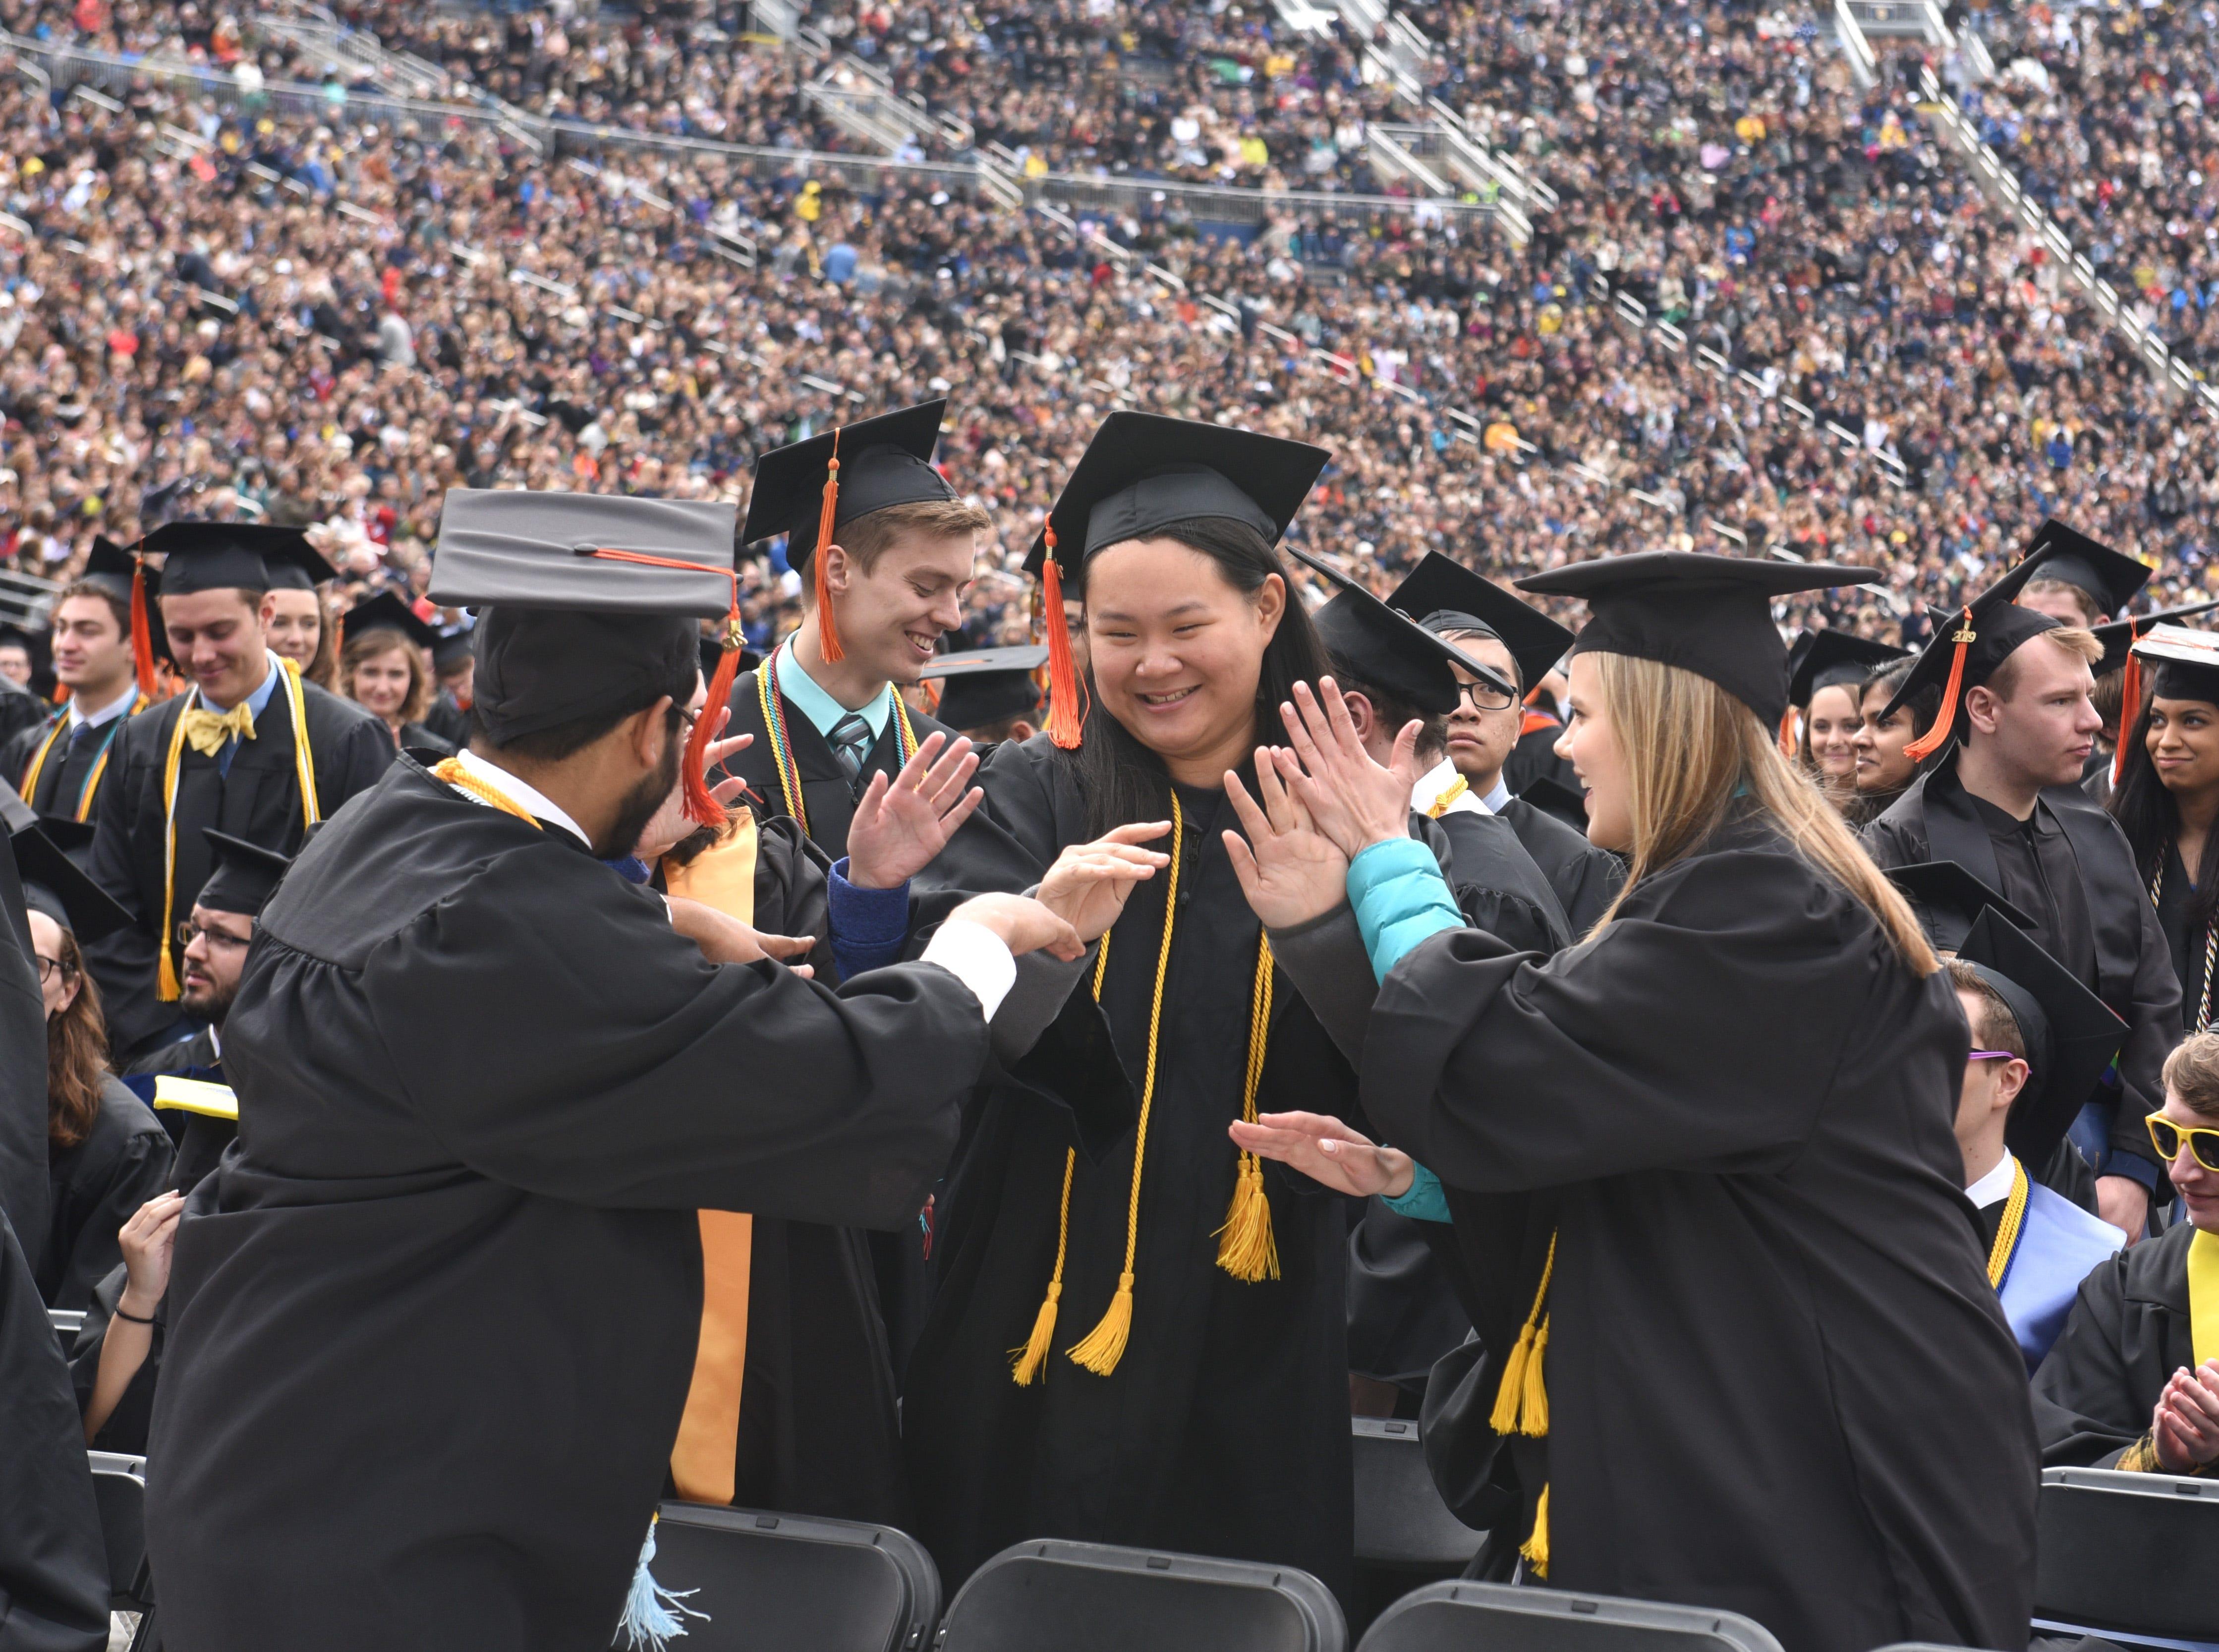 University of Michigan students celebrate.